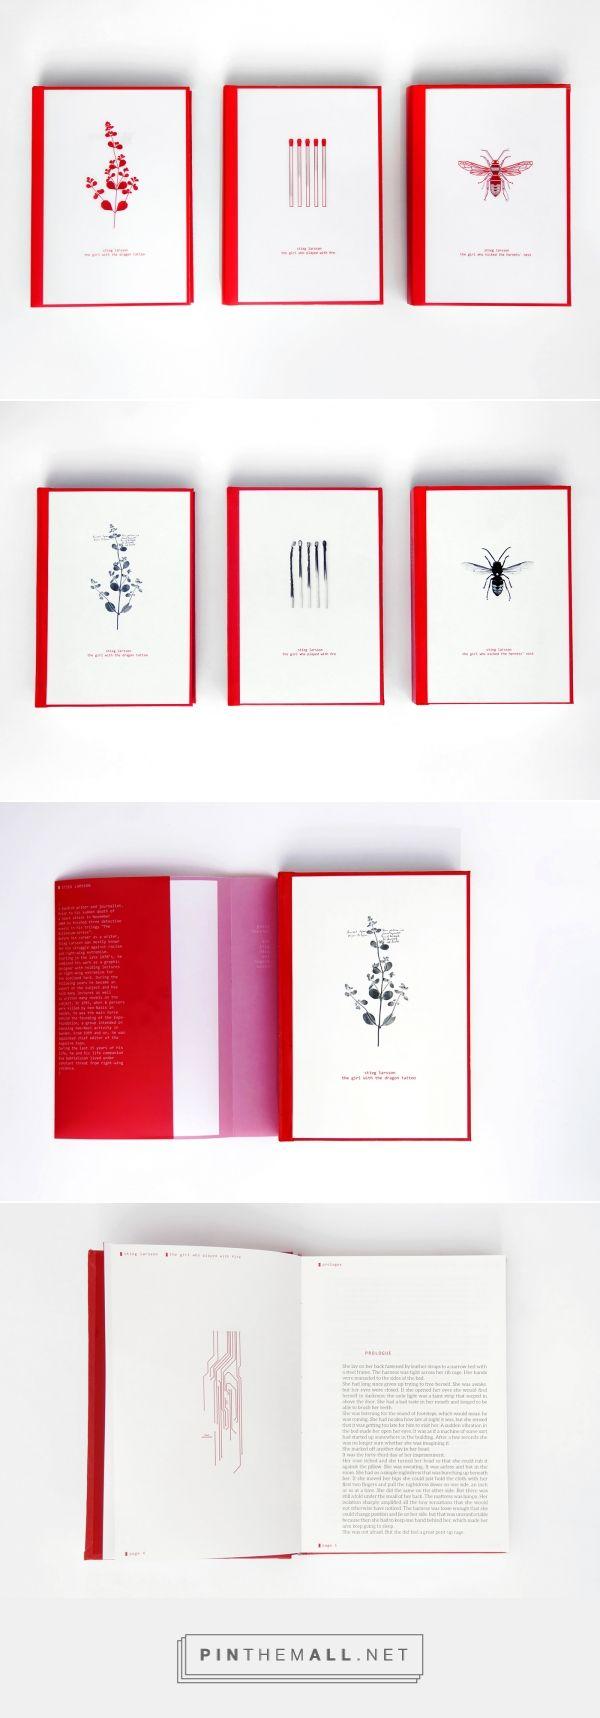 Stieg Larsson, Millenium trilogy | book design on Behance - created via https://pinthemall.net